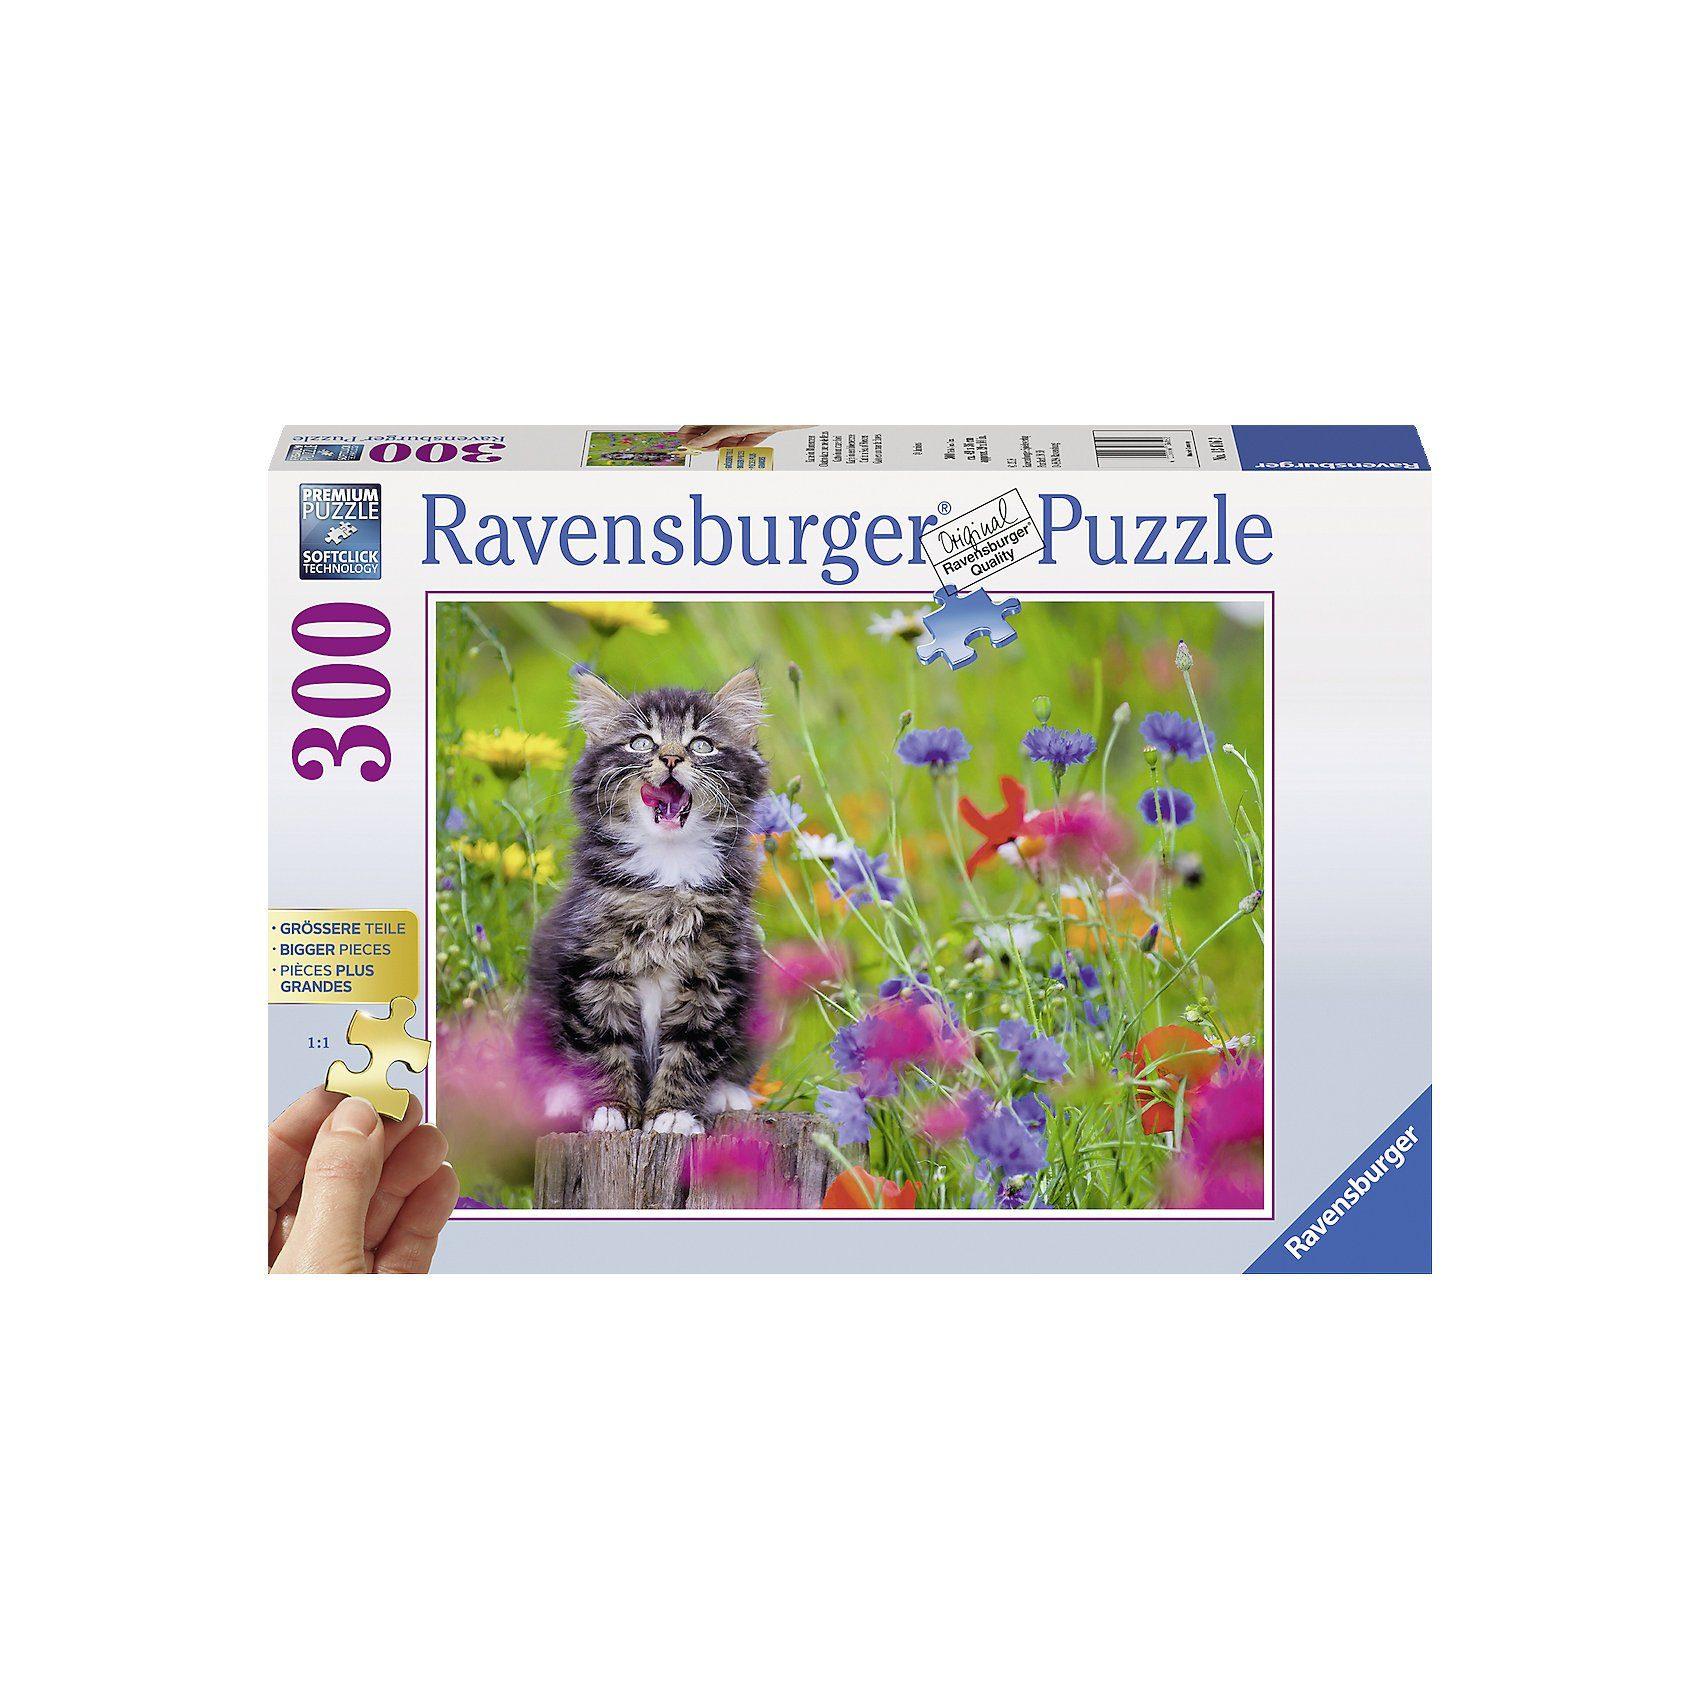 Ravensburger Puzzle 300 Teile Katze im Blumenmeer